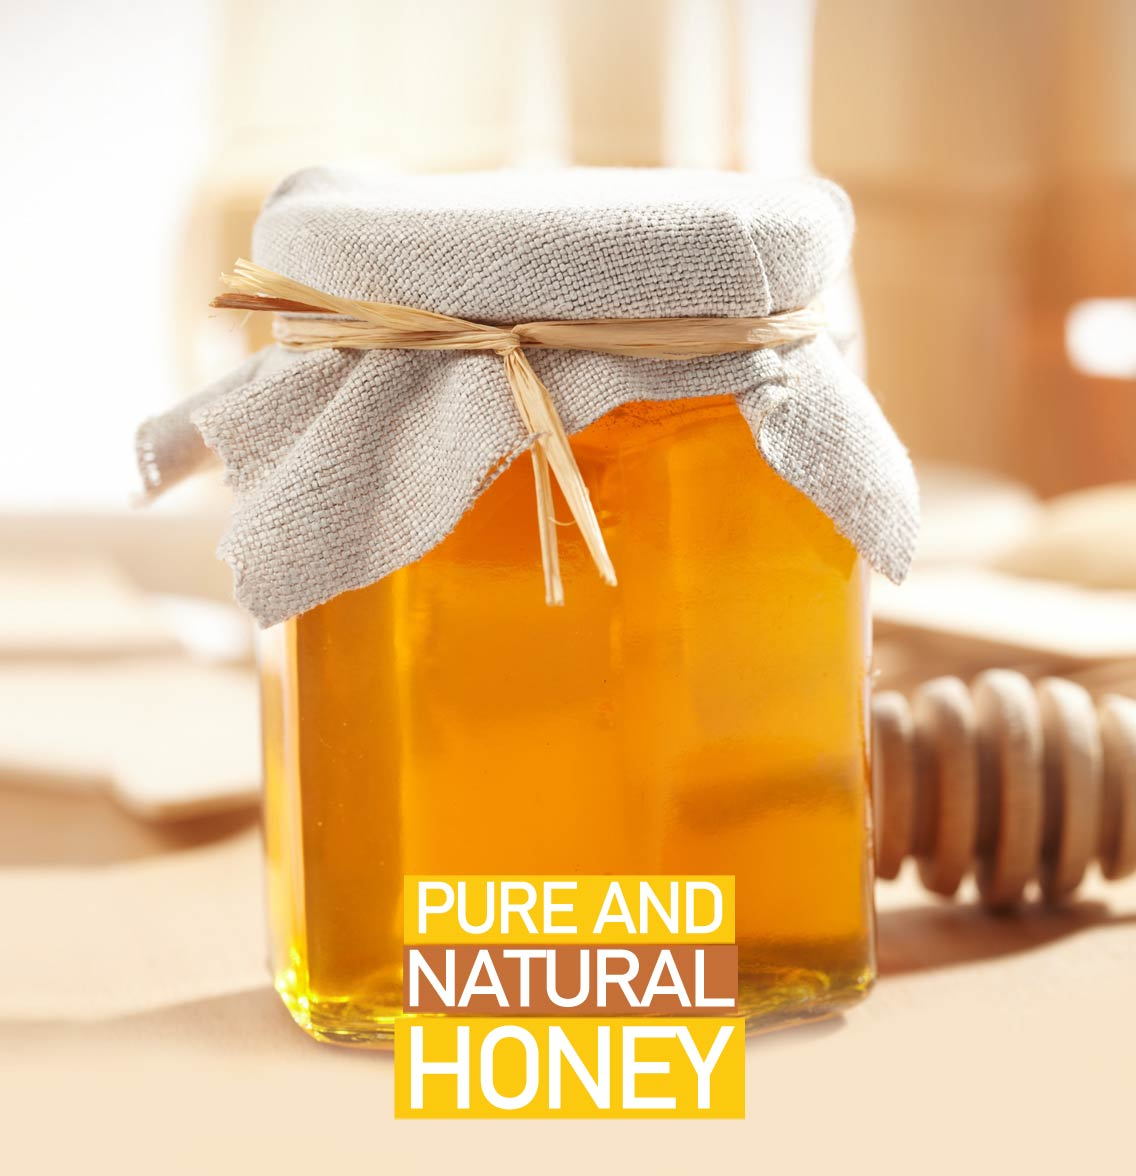 9 Surprising Health Benefits of Pure Honey